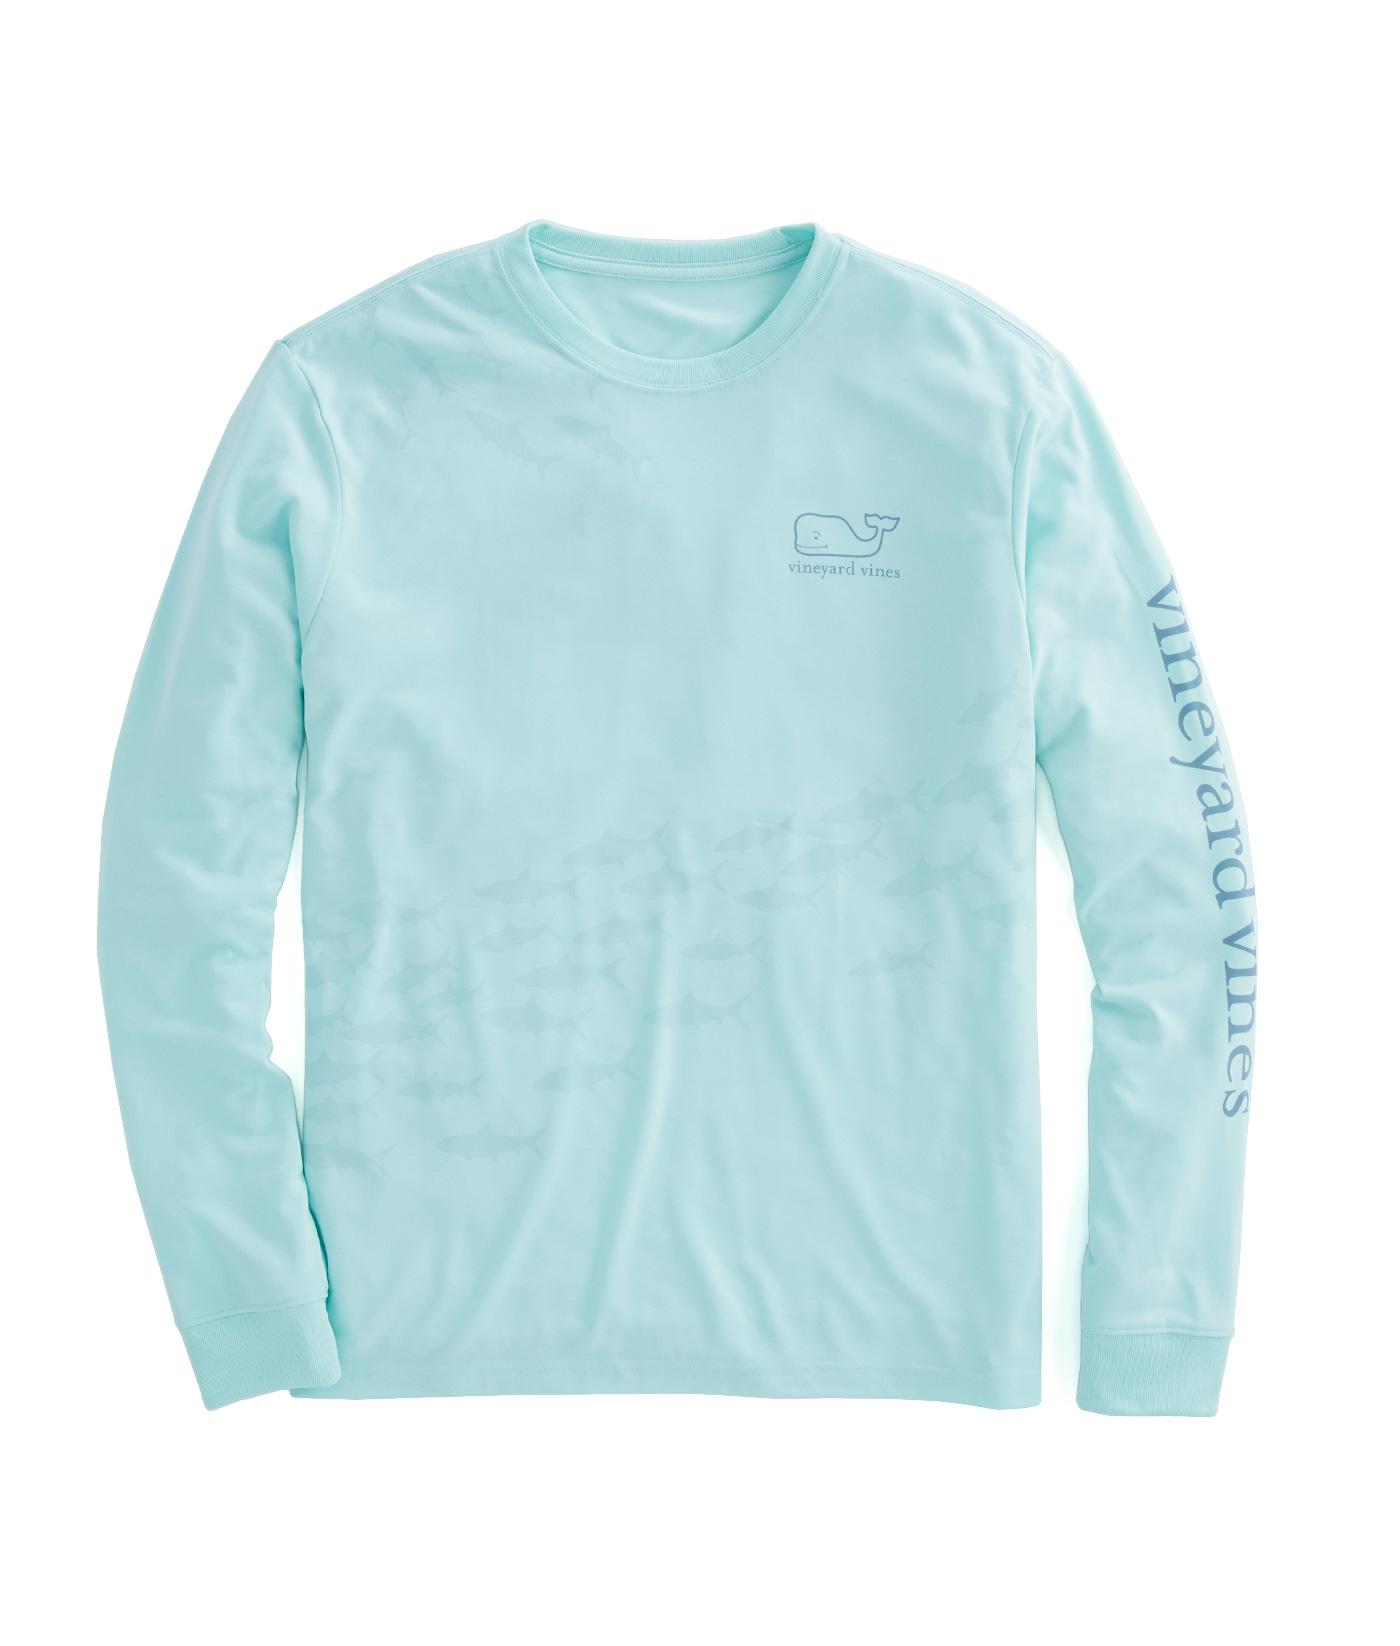 Shop long sleeve fish school performance t shirt at for Vineyard vines fishing shirt